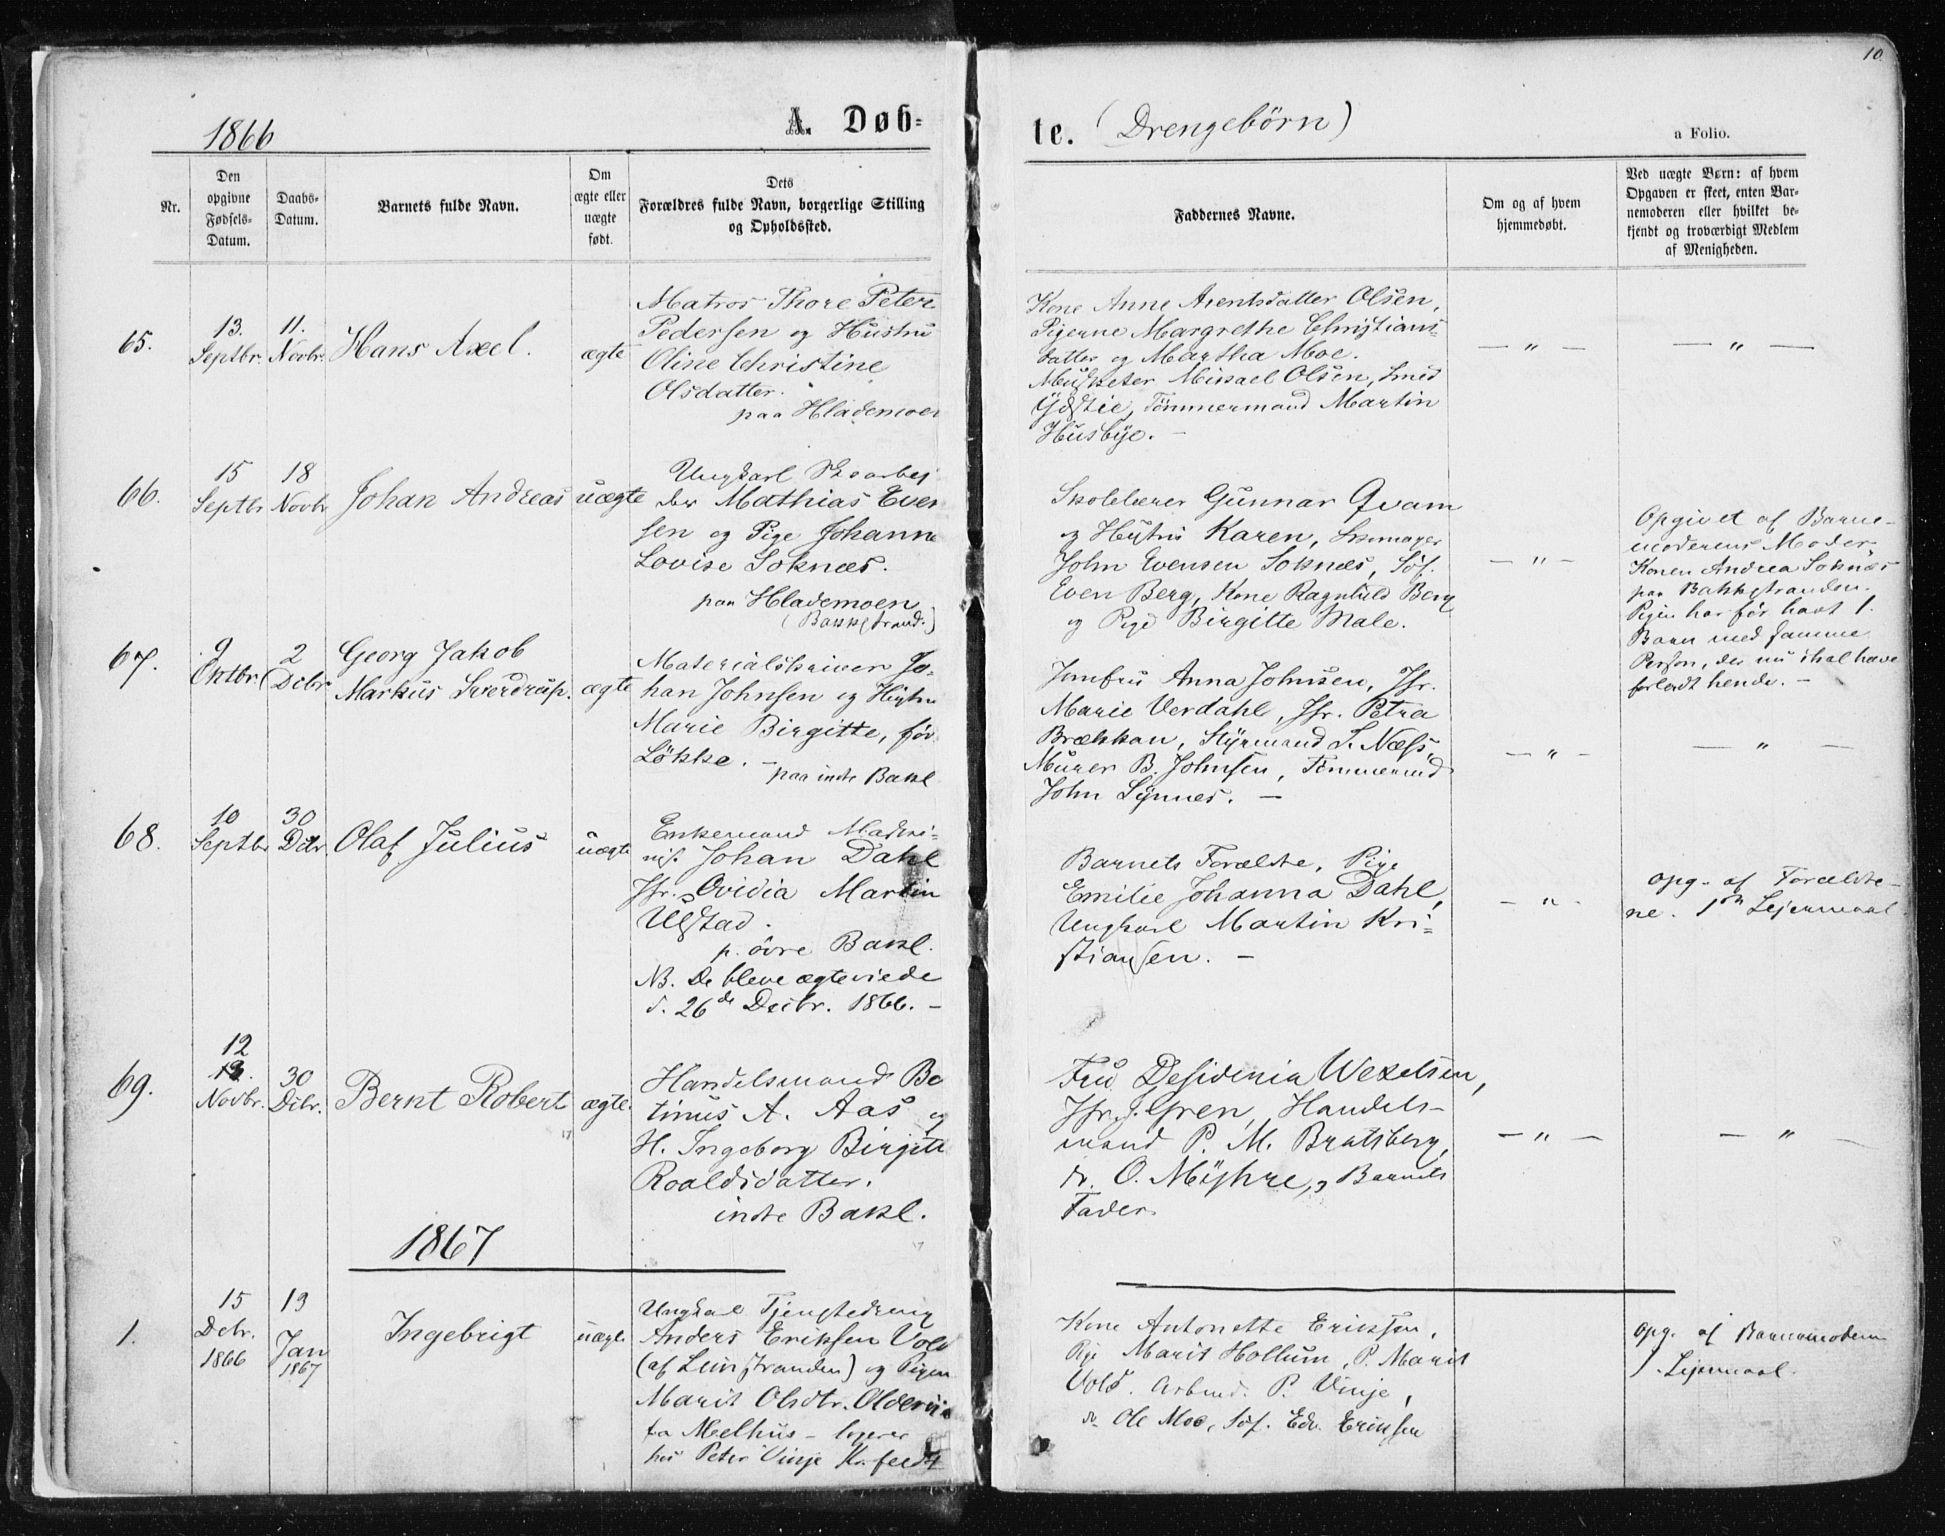 SAT, Ministerialprotokoller, klokkerbøker og fødselsregistre - Sør-Trøndelag, 604/L0186: Parish register (official) no. 604A07, 1866-1877, p. 10